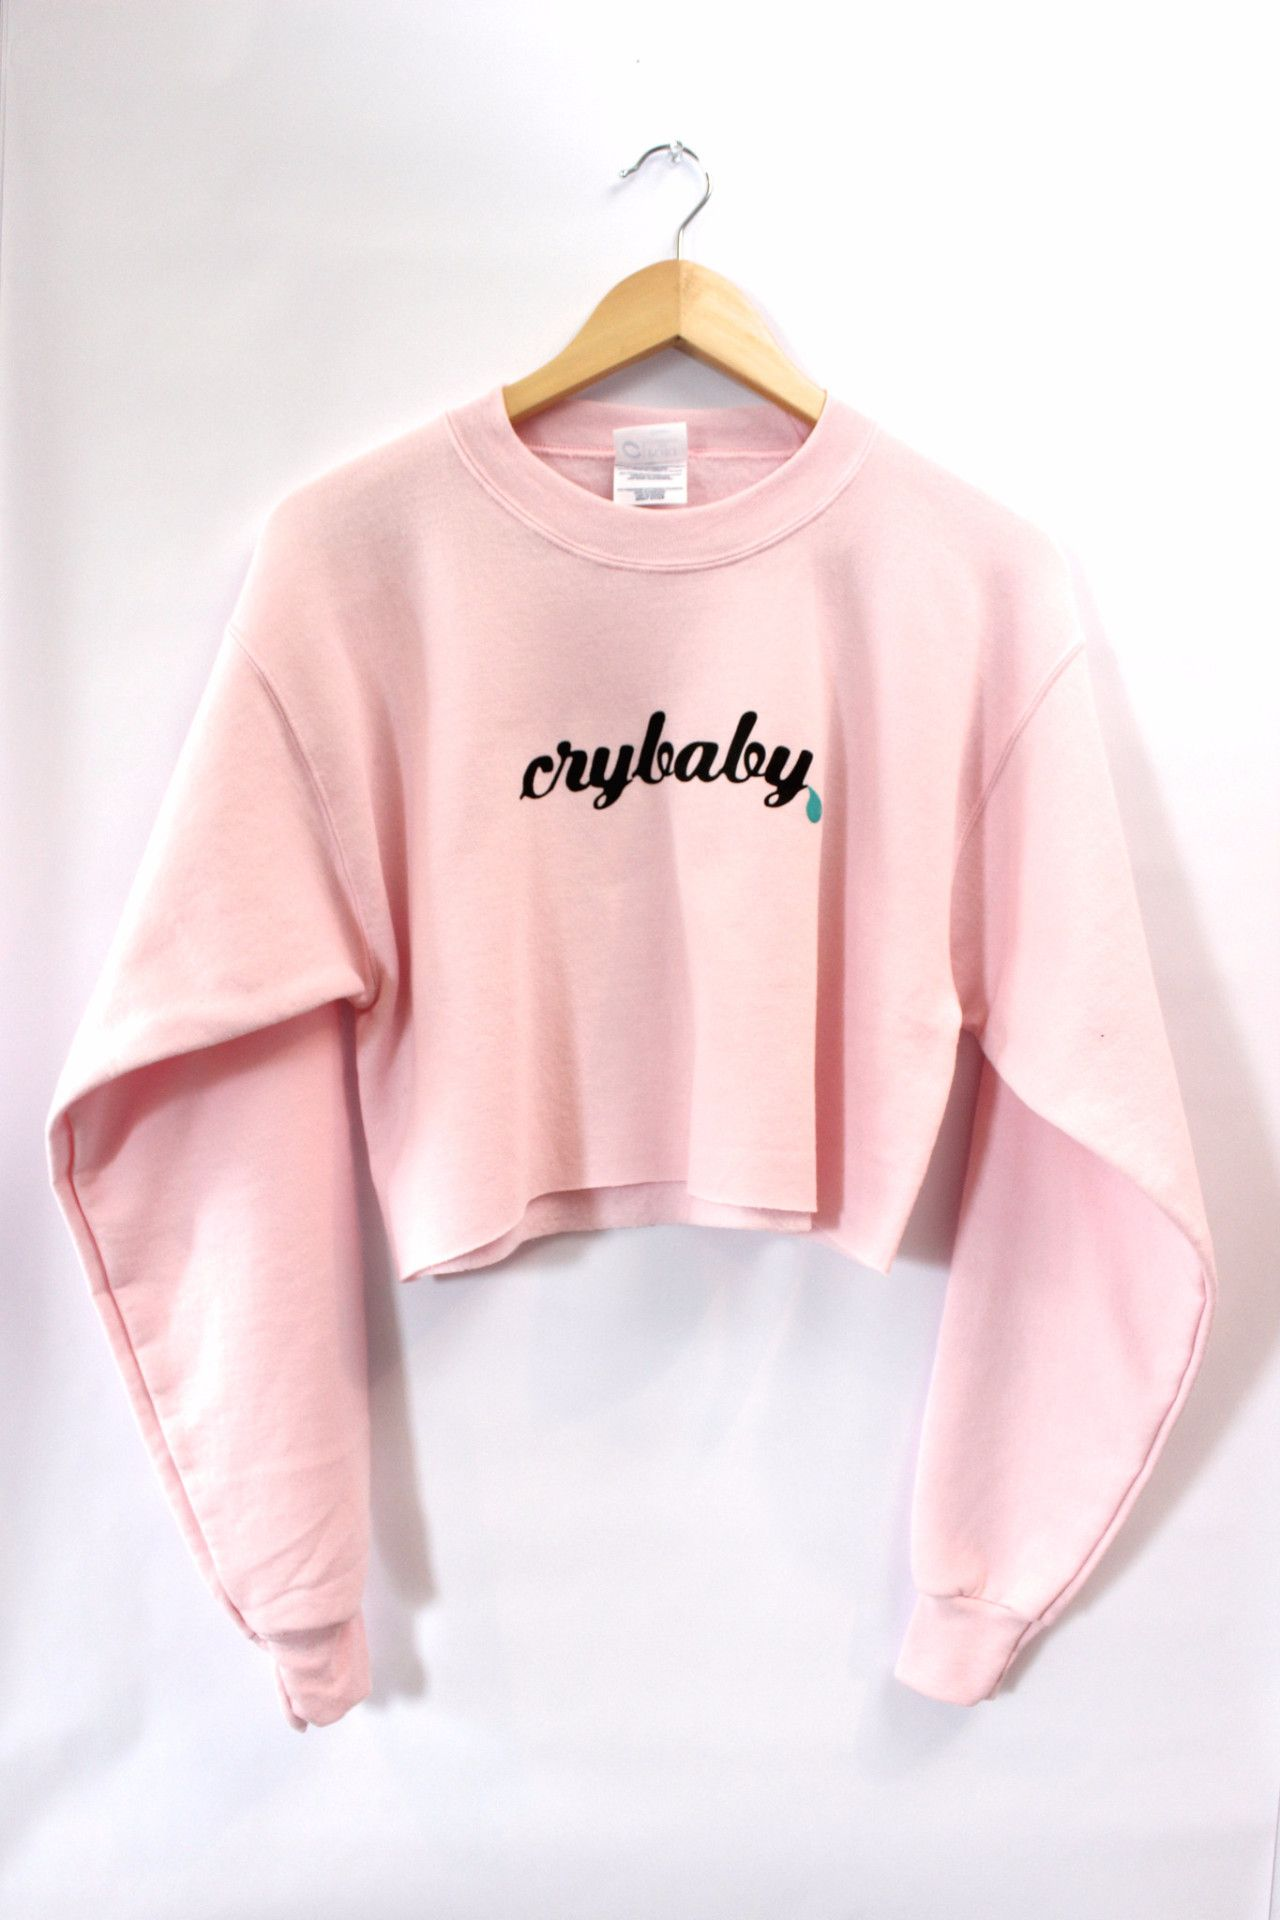 f2f1936b1fd3 Crybaby Pastel Pink Cropped Graphic Crewneck Sweatshirt